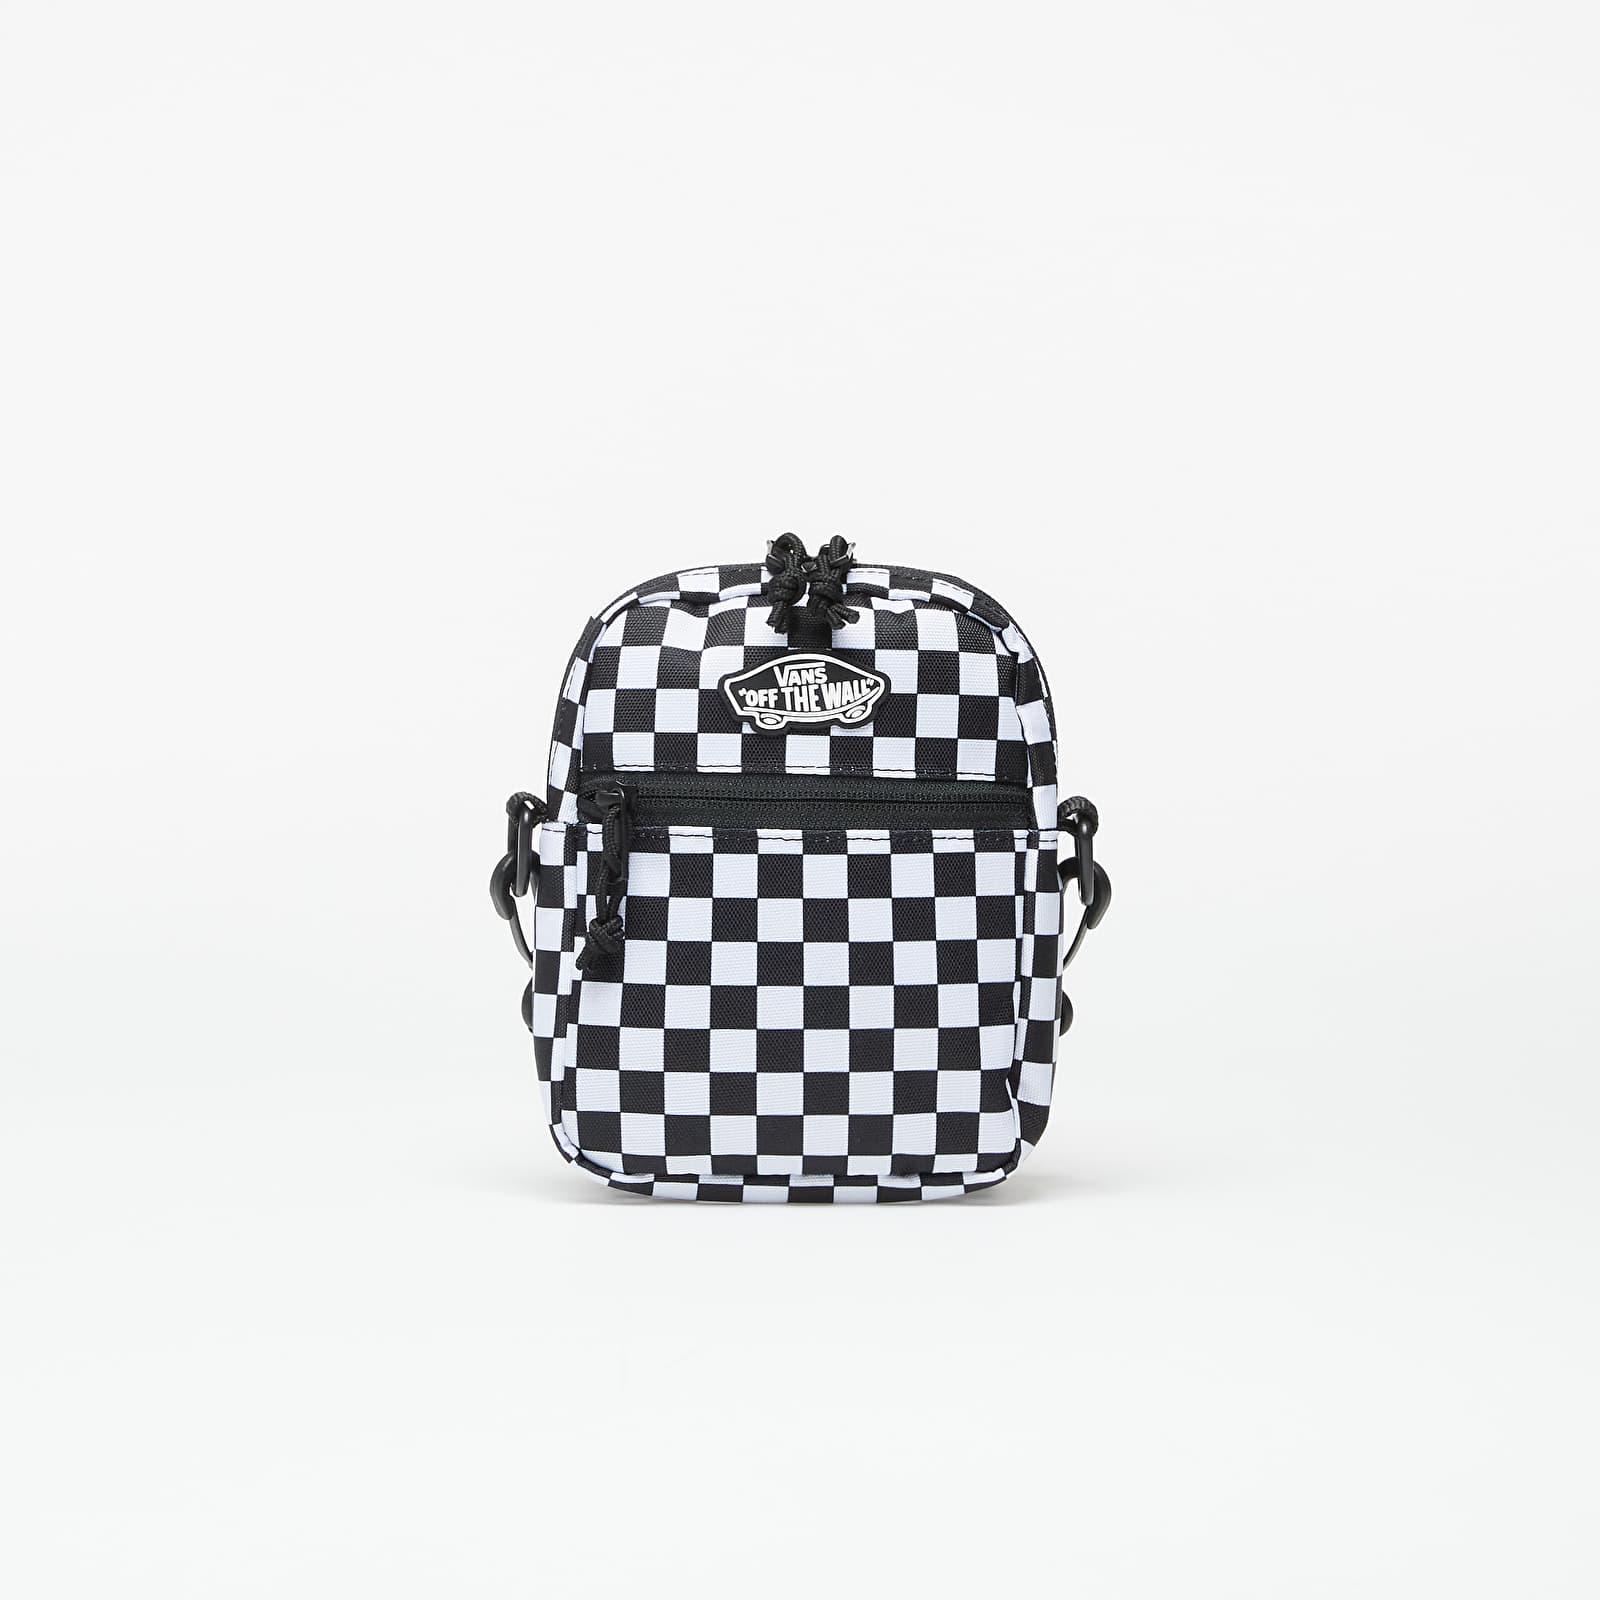 Sacs Vans Street Ready Ii Crossbody Black/ White Checkerboard